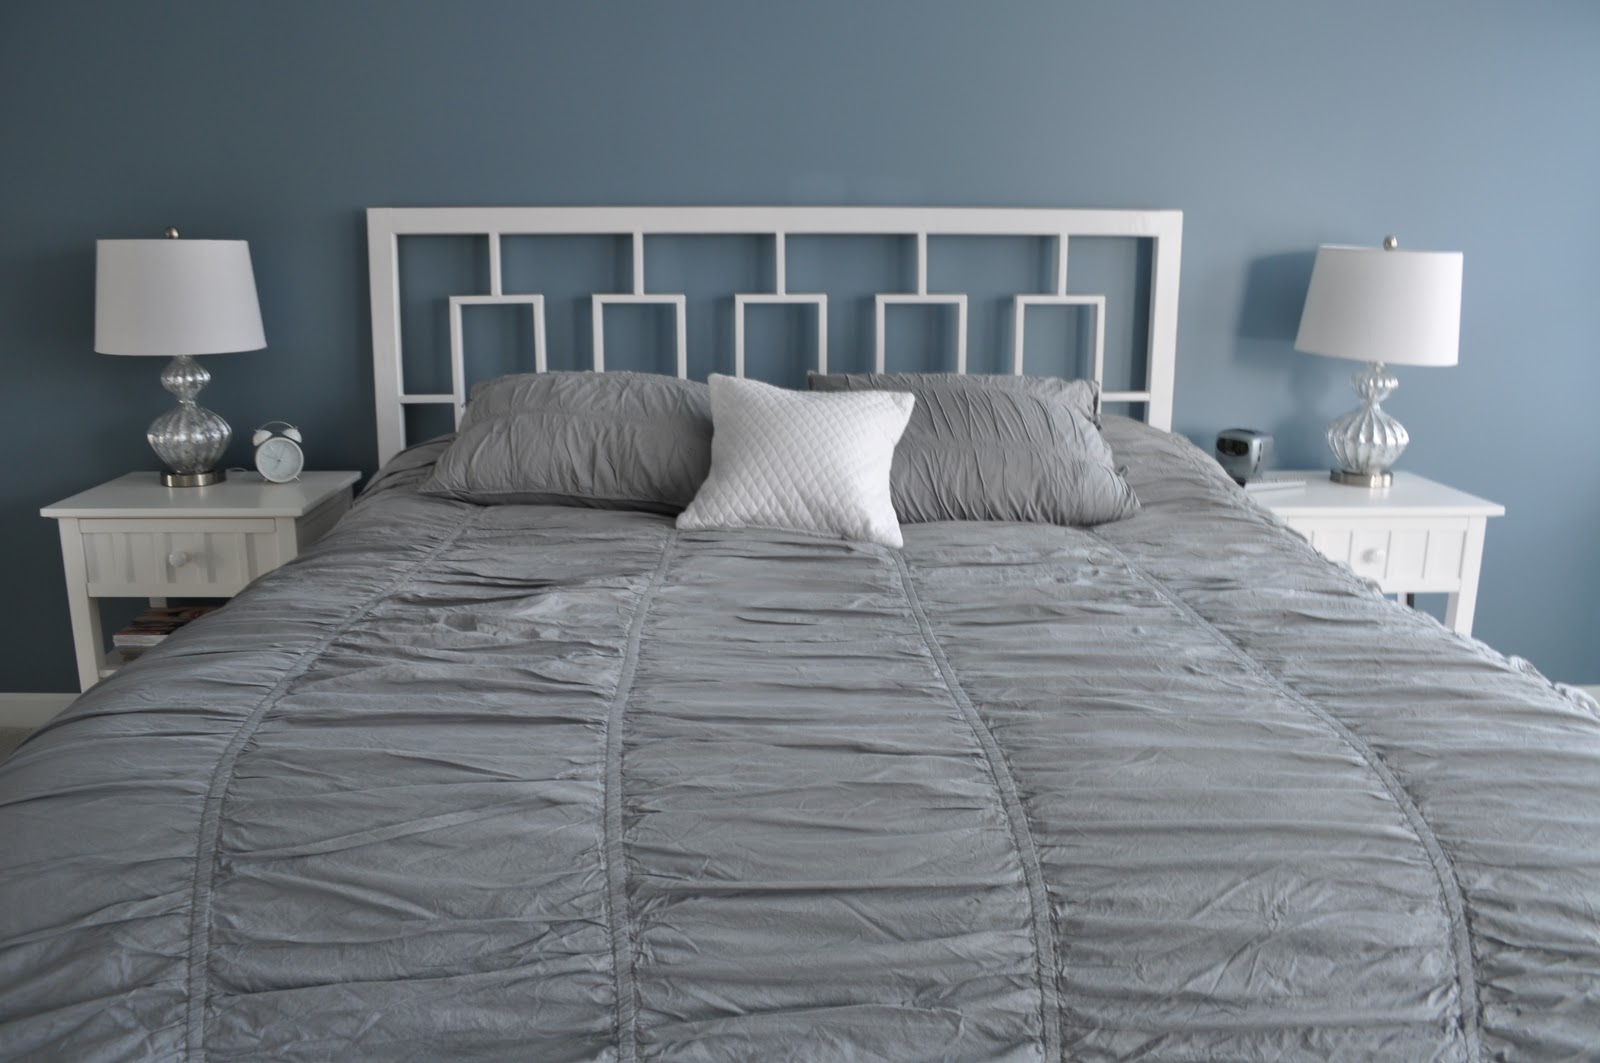 decor and the dog west elm parachute duvet review. Black Bedroom Furniture Sets. Home Design Ideas